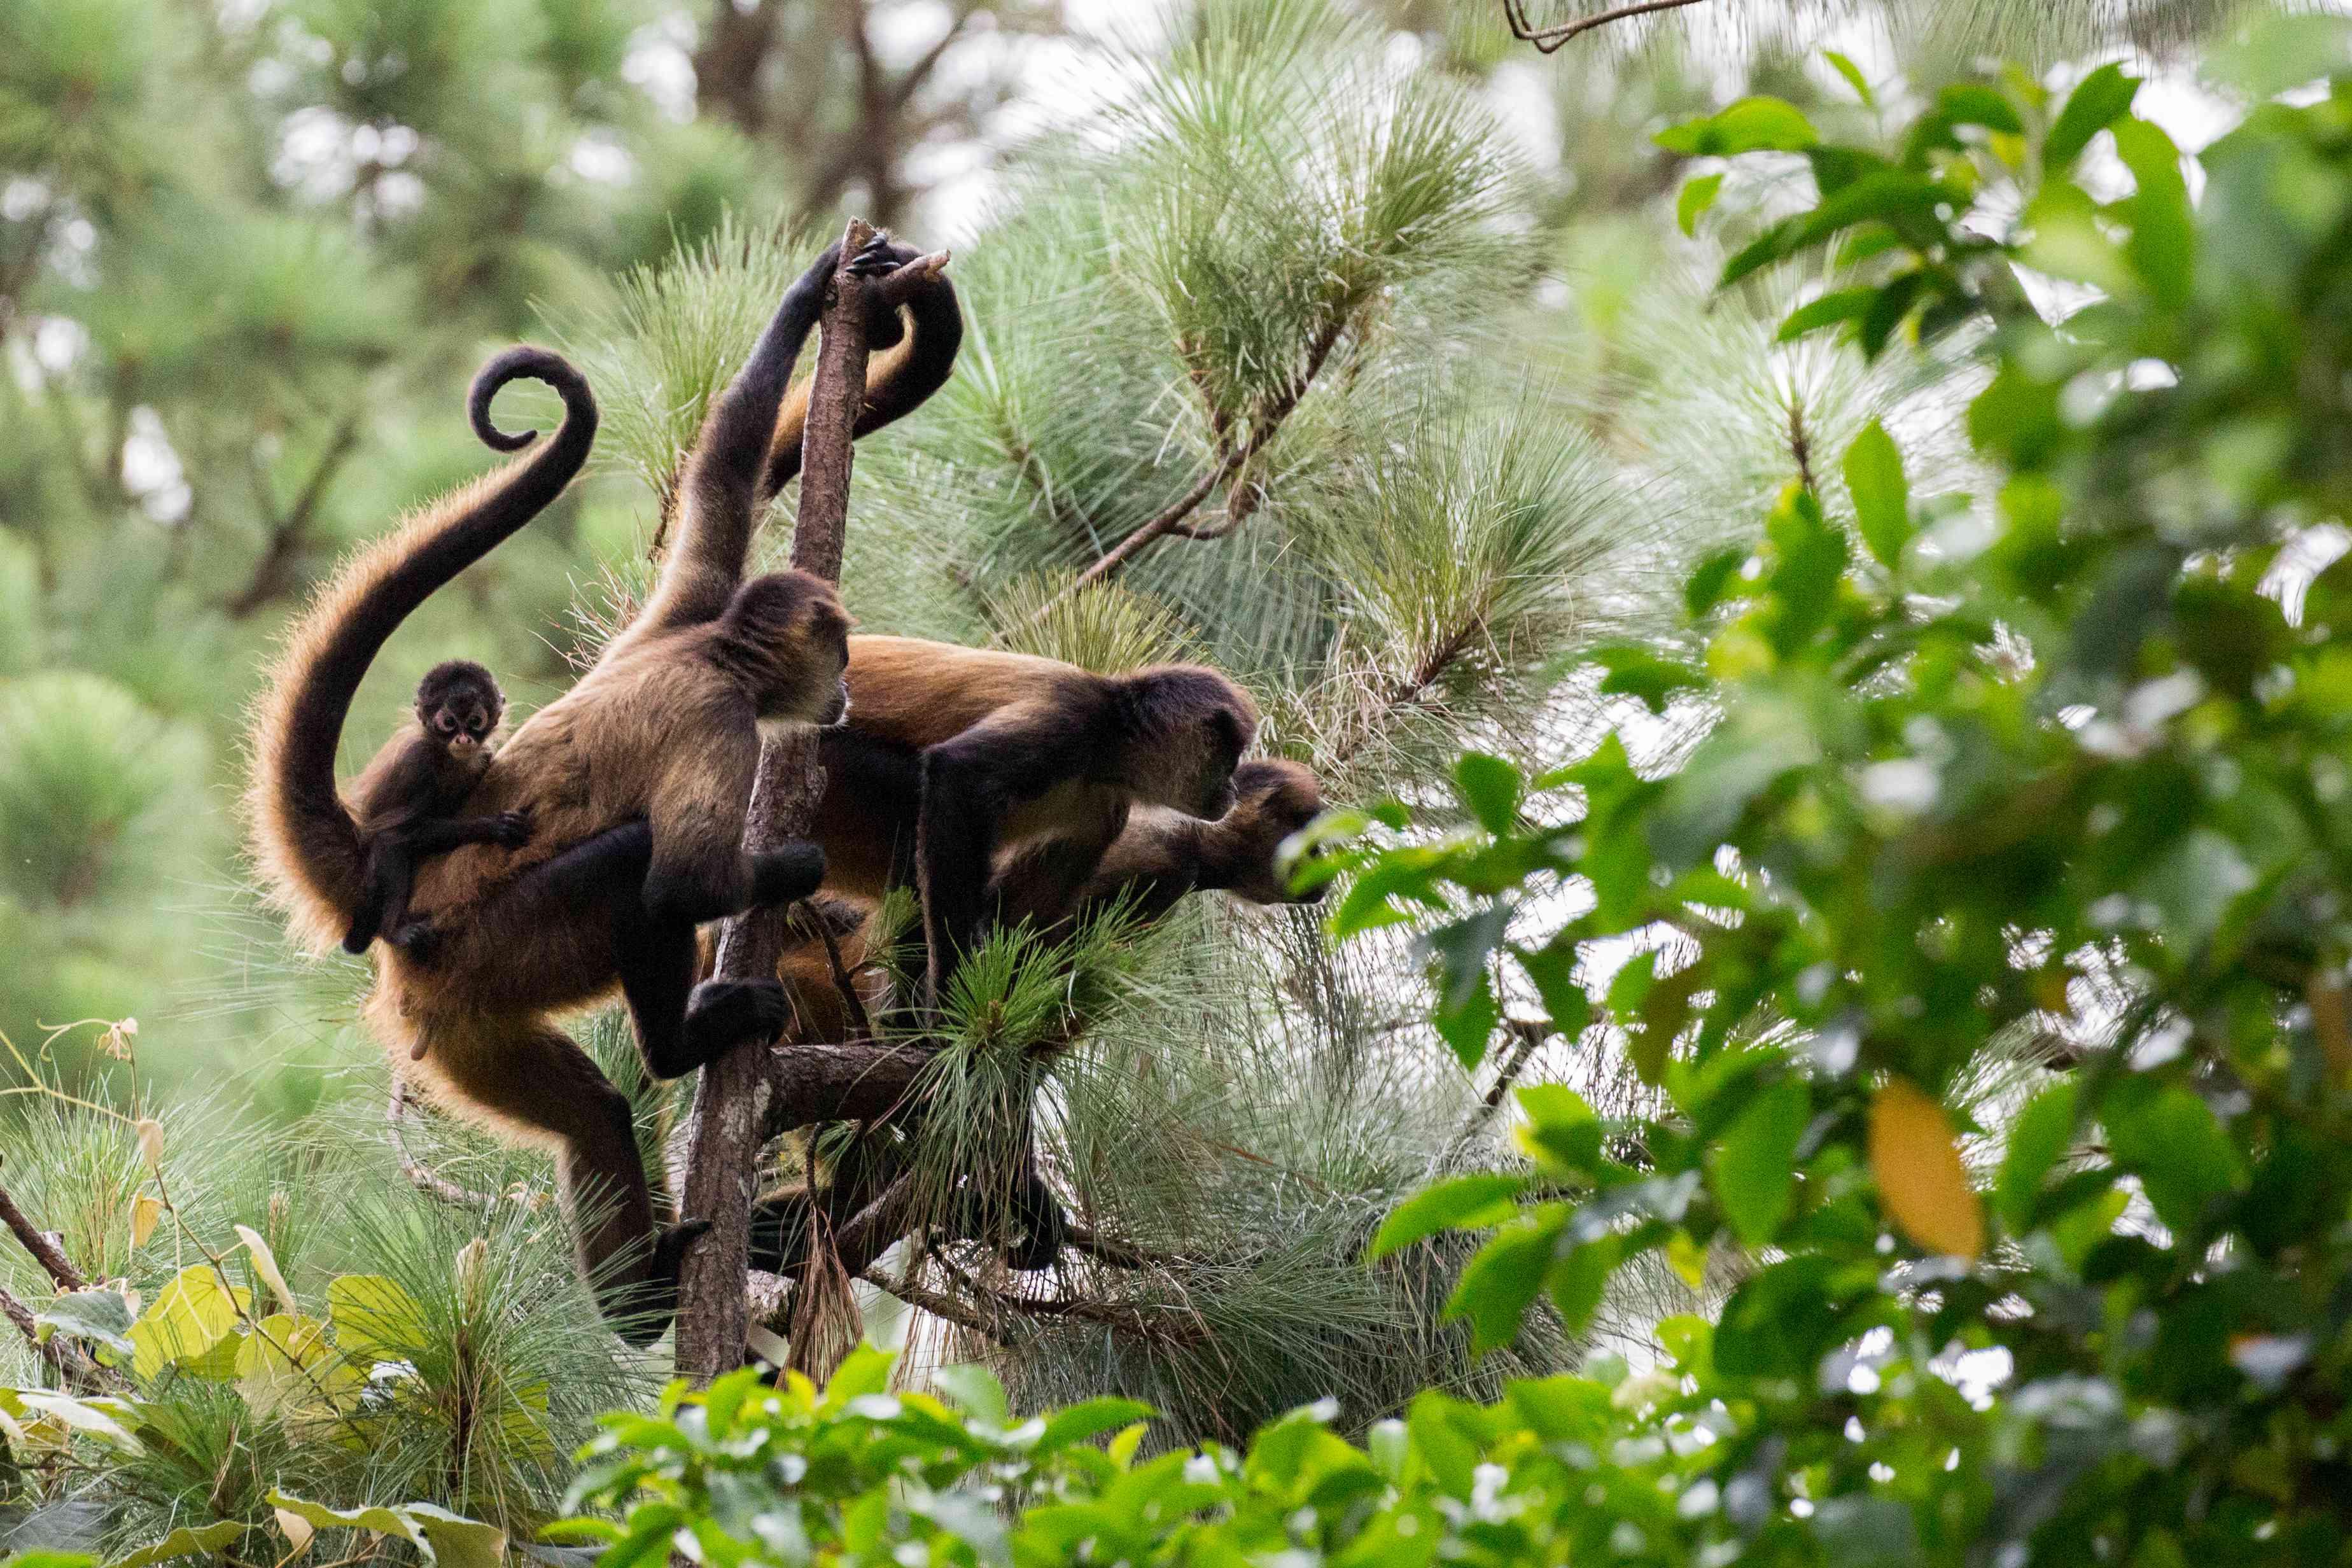 troop of spider monkeys in Costa Rica